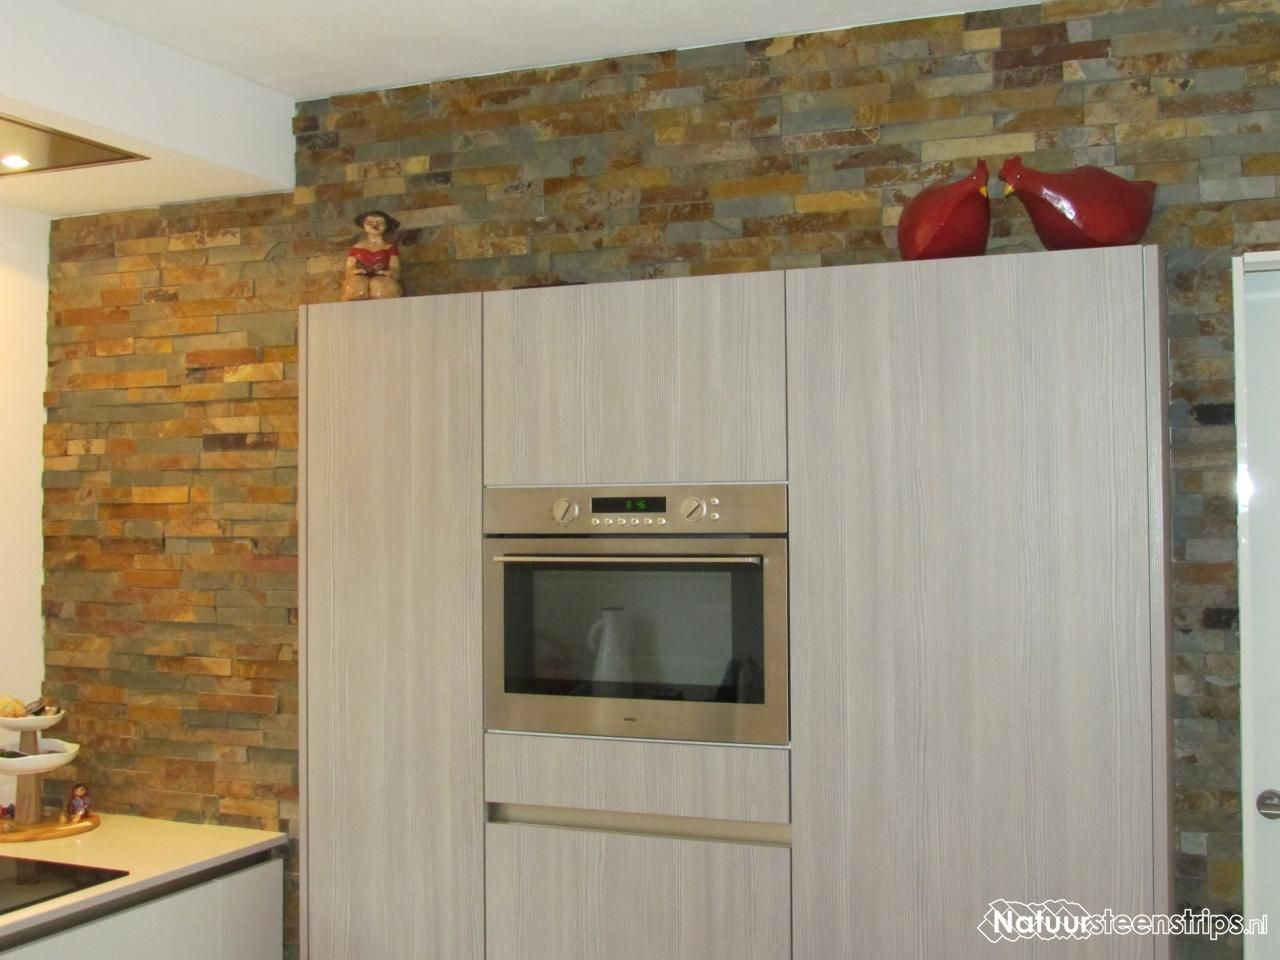 Keukenwand bekleed met Natuursteenstrips Lei Roestblauw.